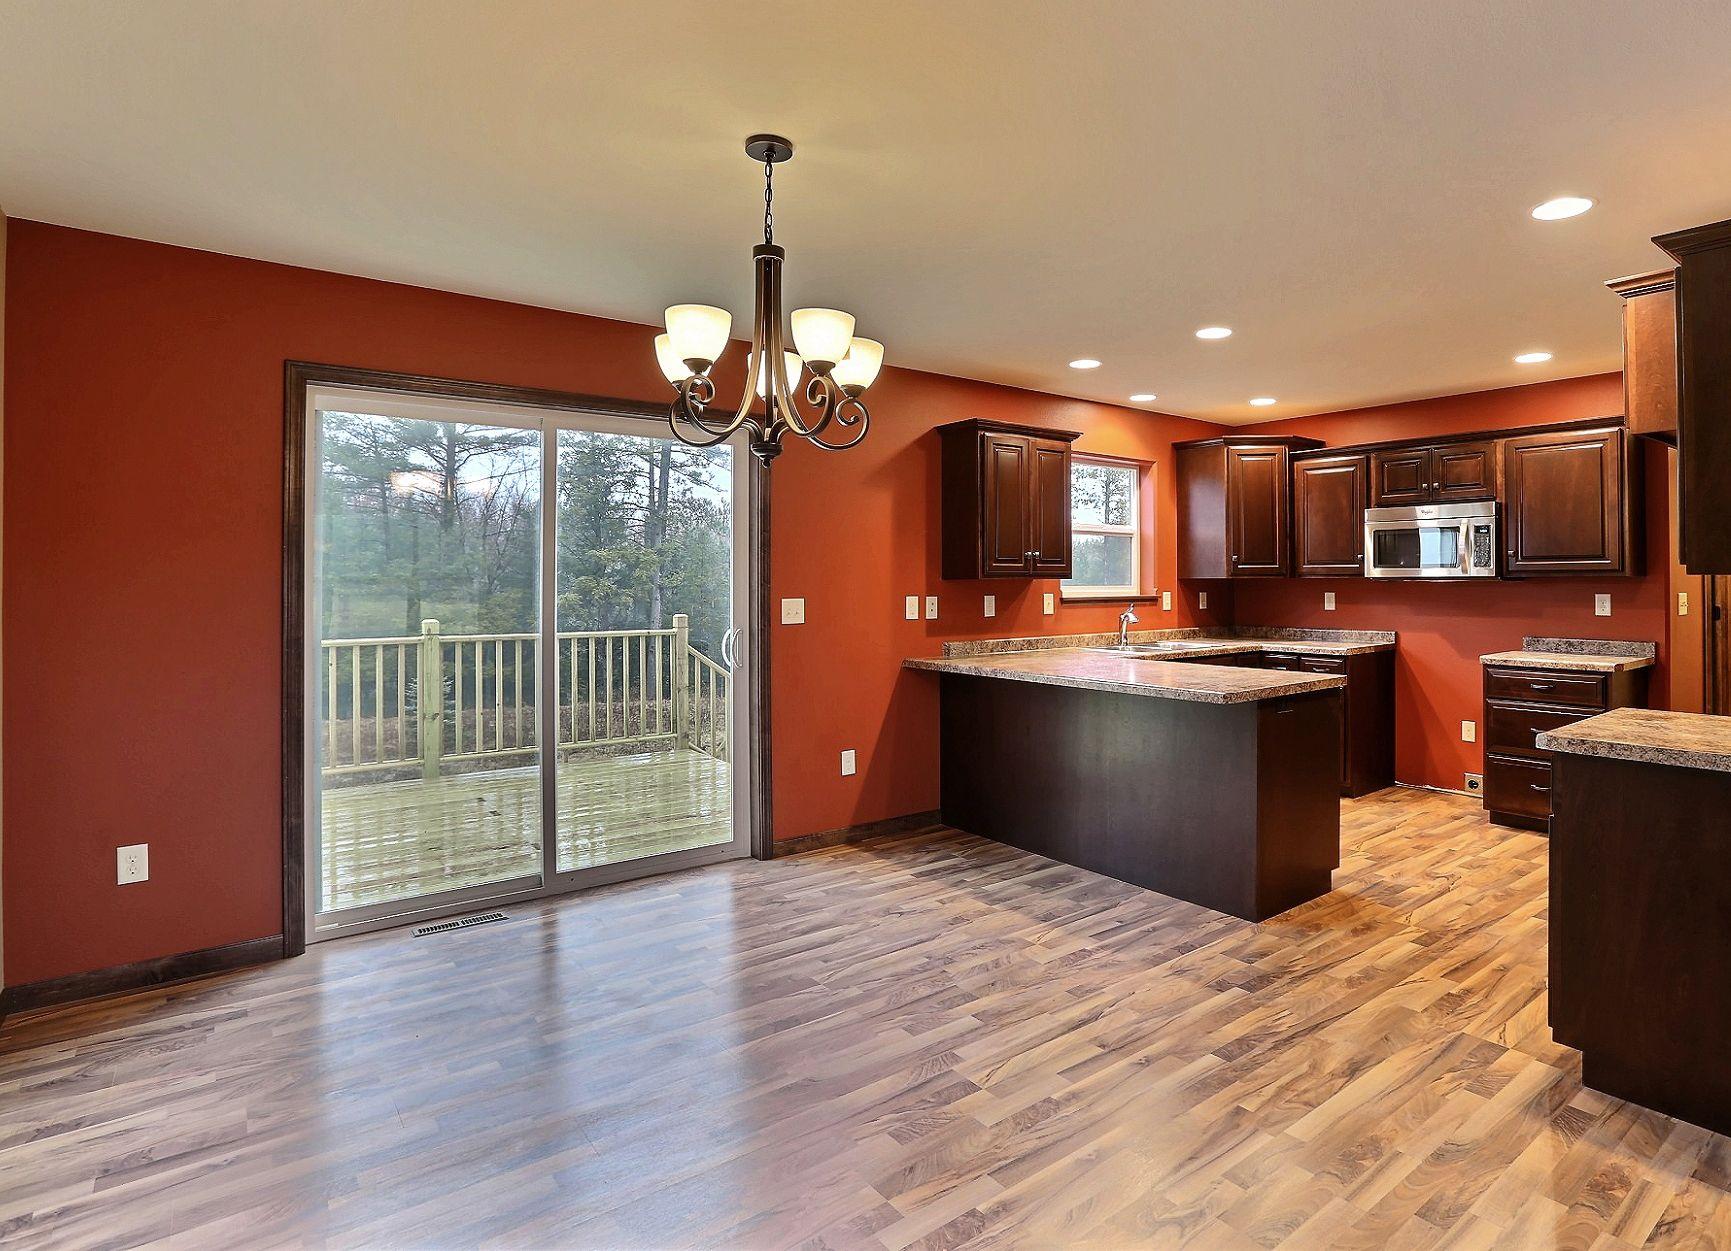 fc7 - Denyon Homes | Kitchen wall colors, Walnut kitchen ...